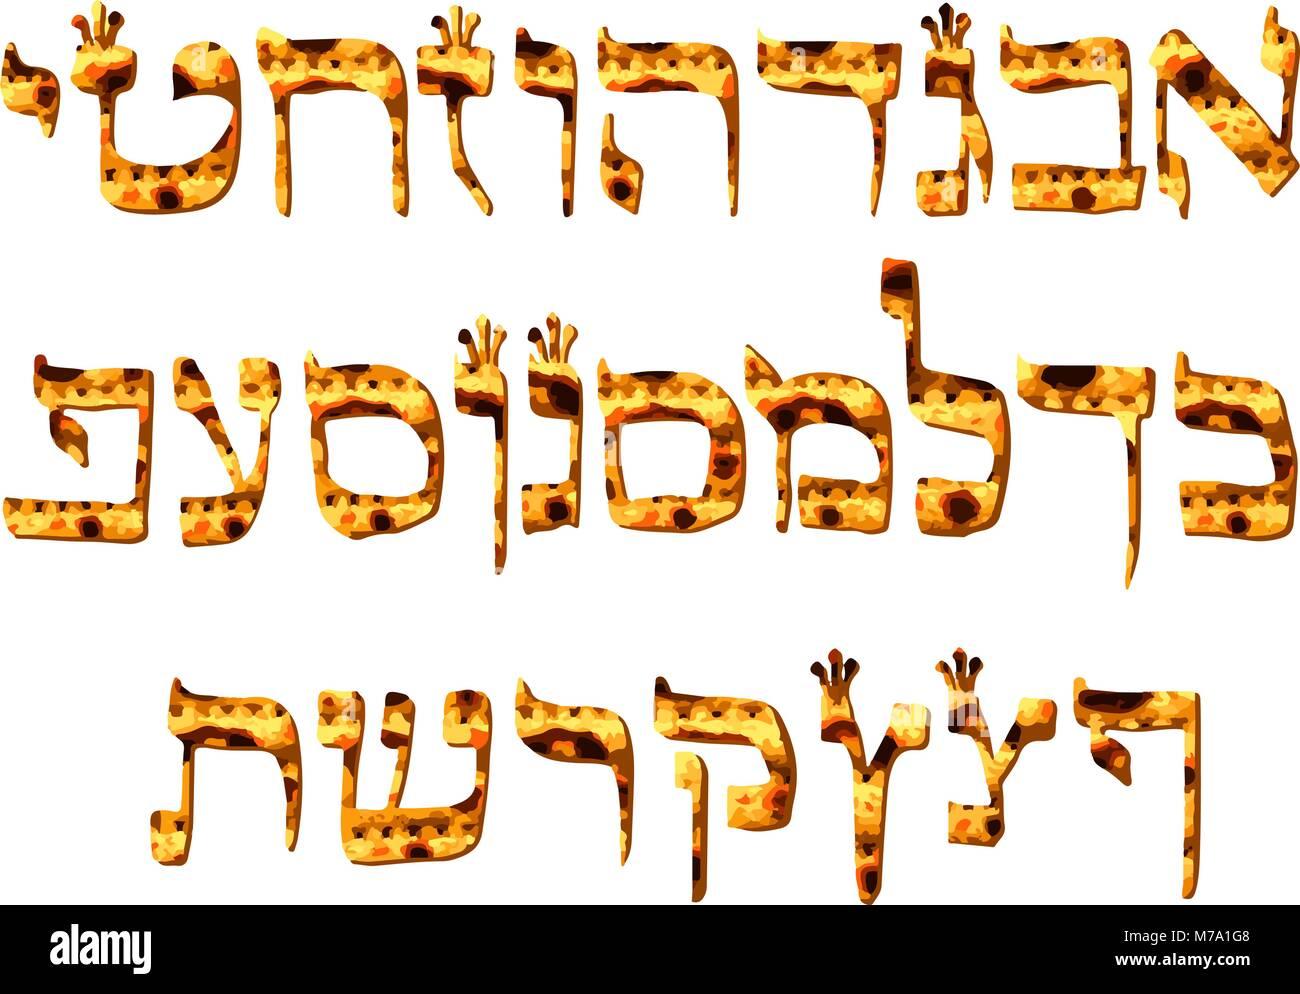 Alphabet Hebrew Passover matzah. Hebrew letter Pesach. Calligraphy font. Jewish Easter. Texture matzo. Vector illustration - Stock Image